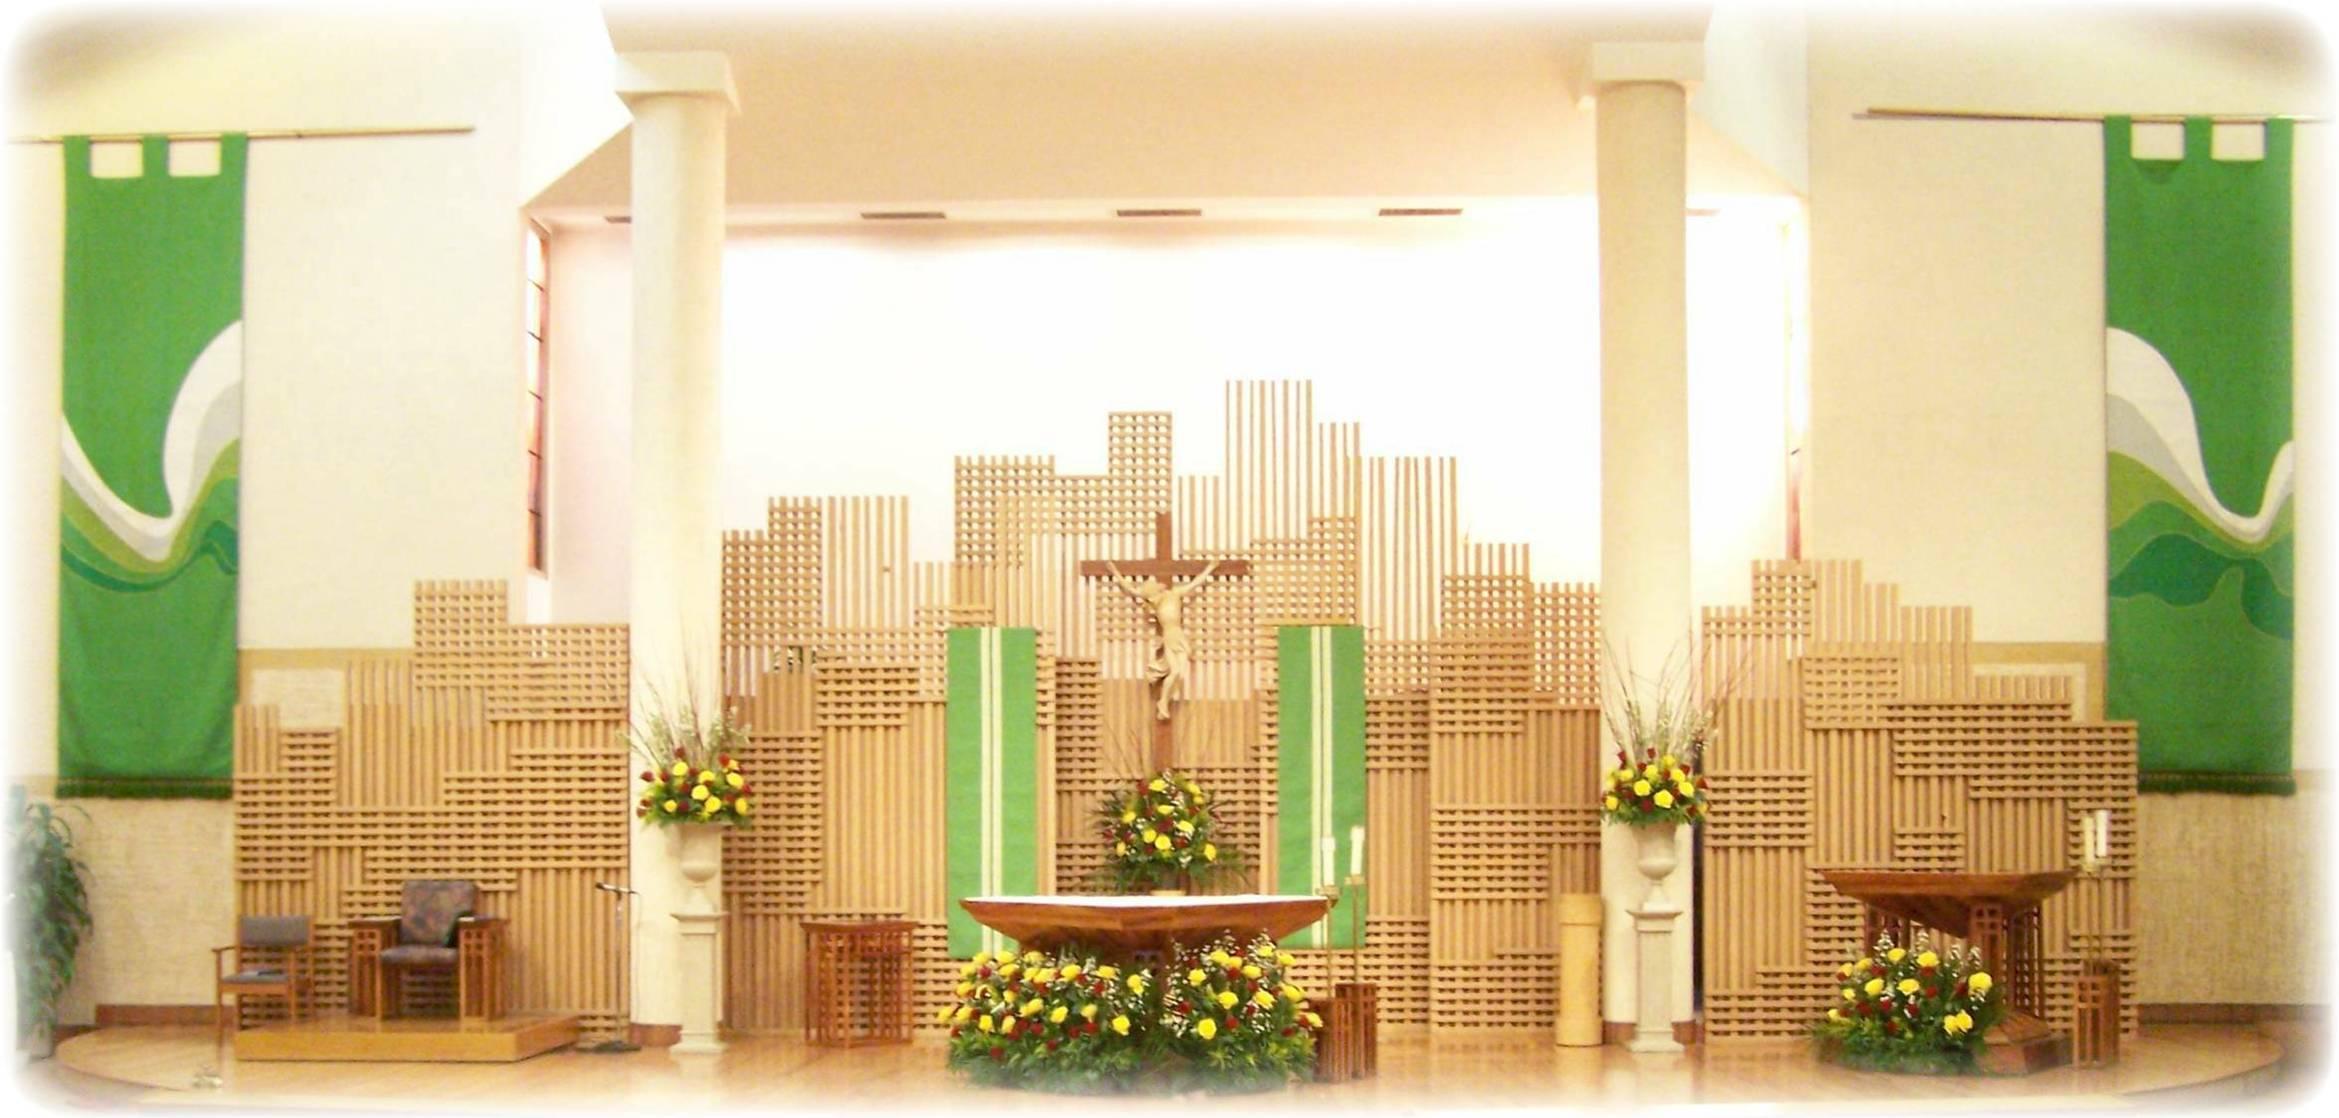 St. Elizabeth Ann Seton Parish, 1835 Larkvane Road, Rowland Heights, California, 91748, United States